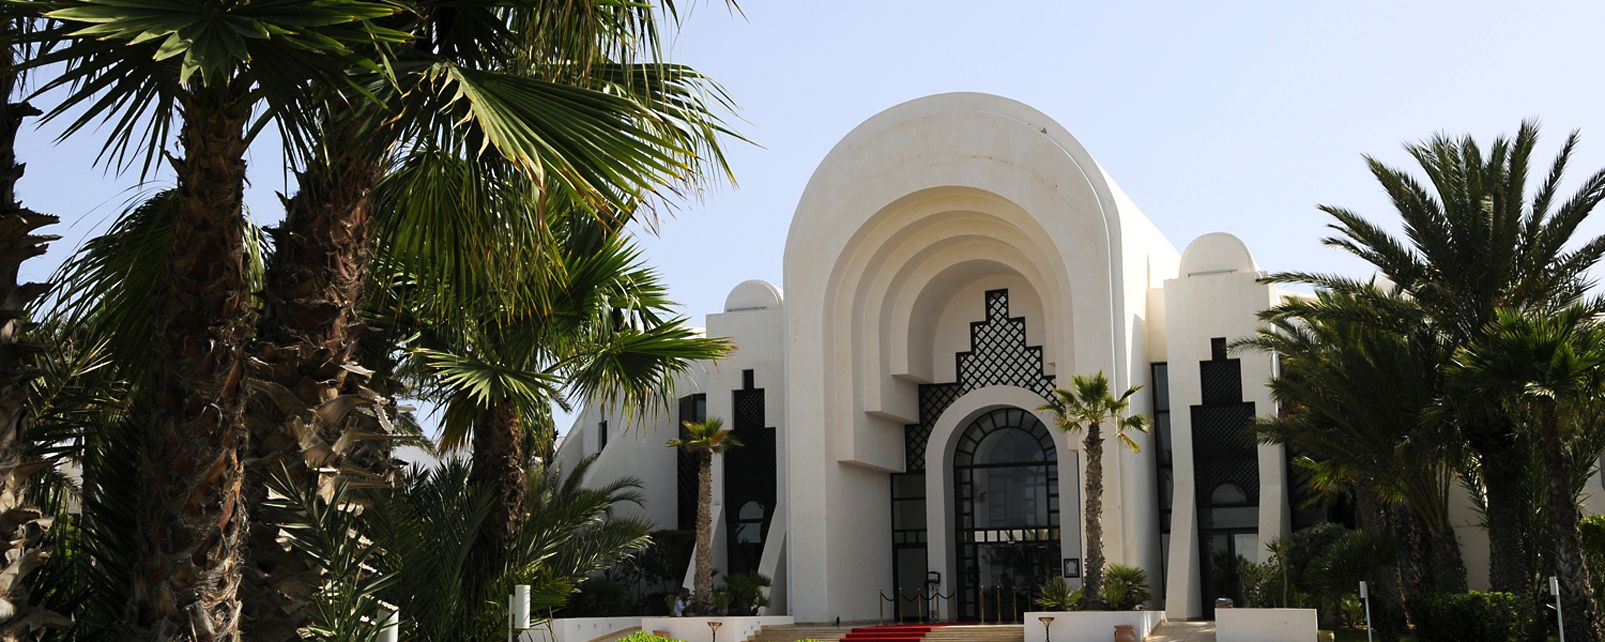 Hôtel Radisson Blu Palace Resort & Thalasso